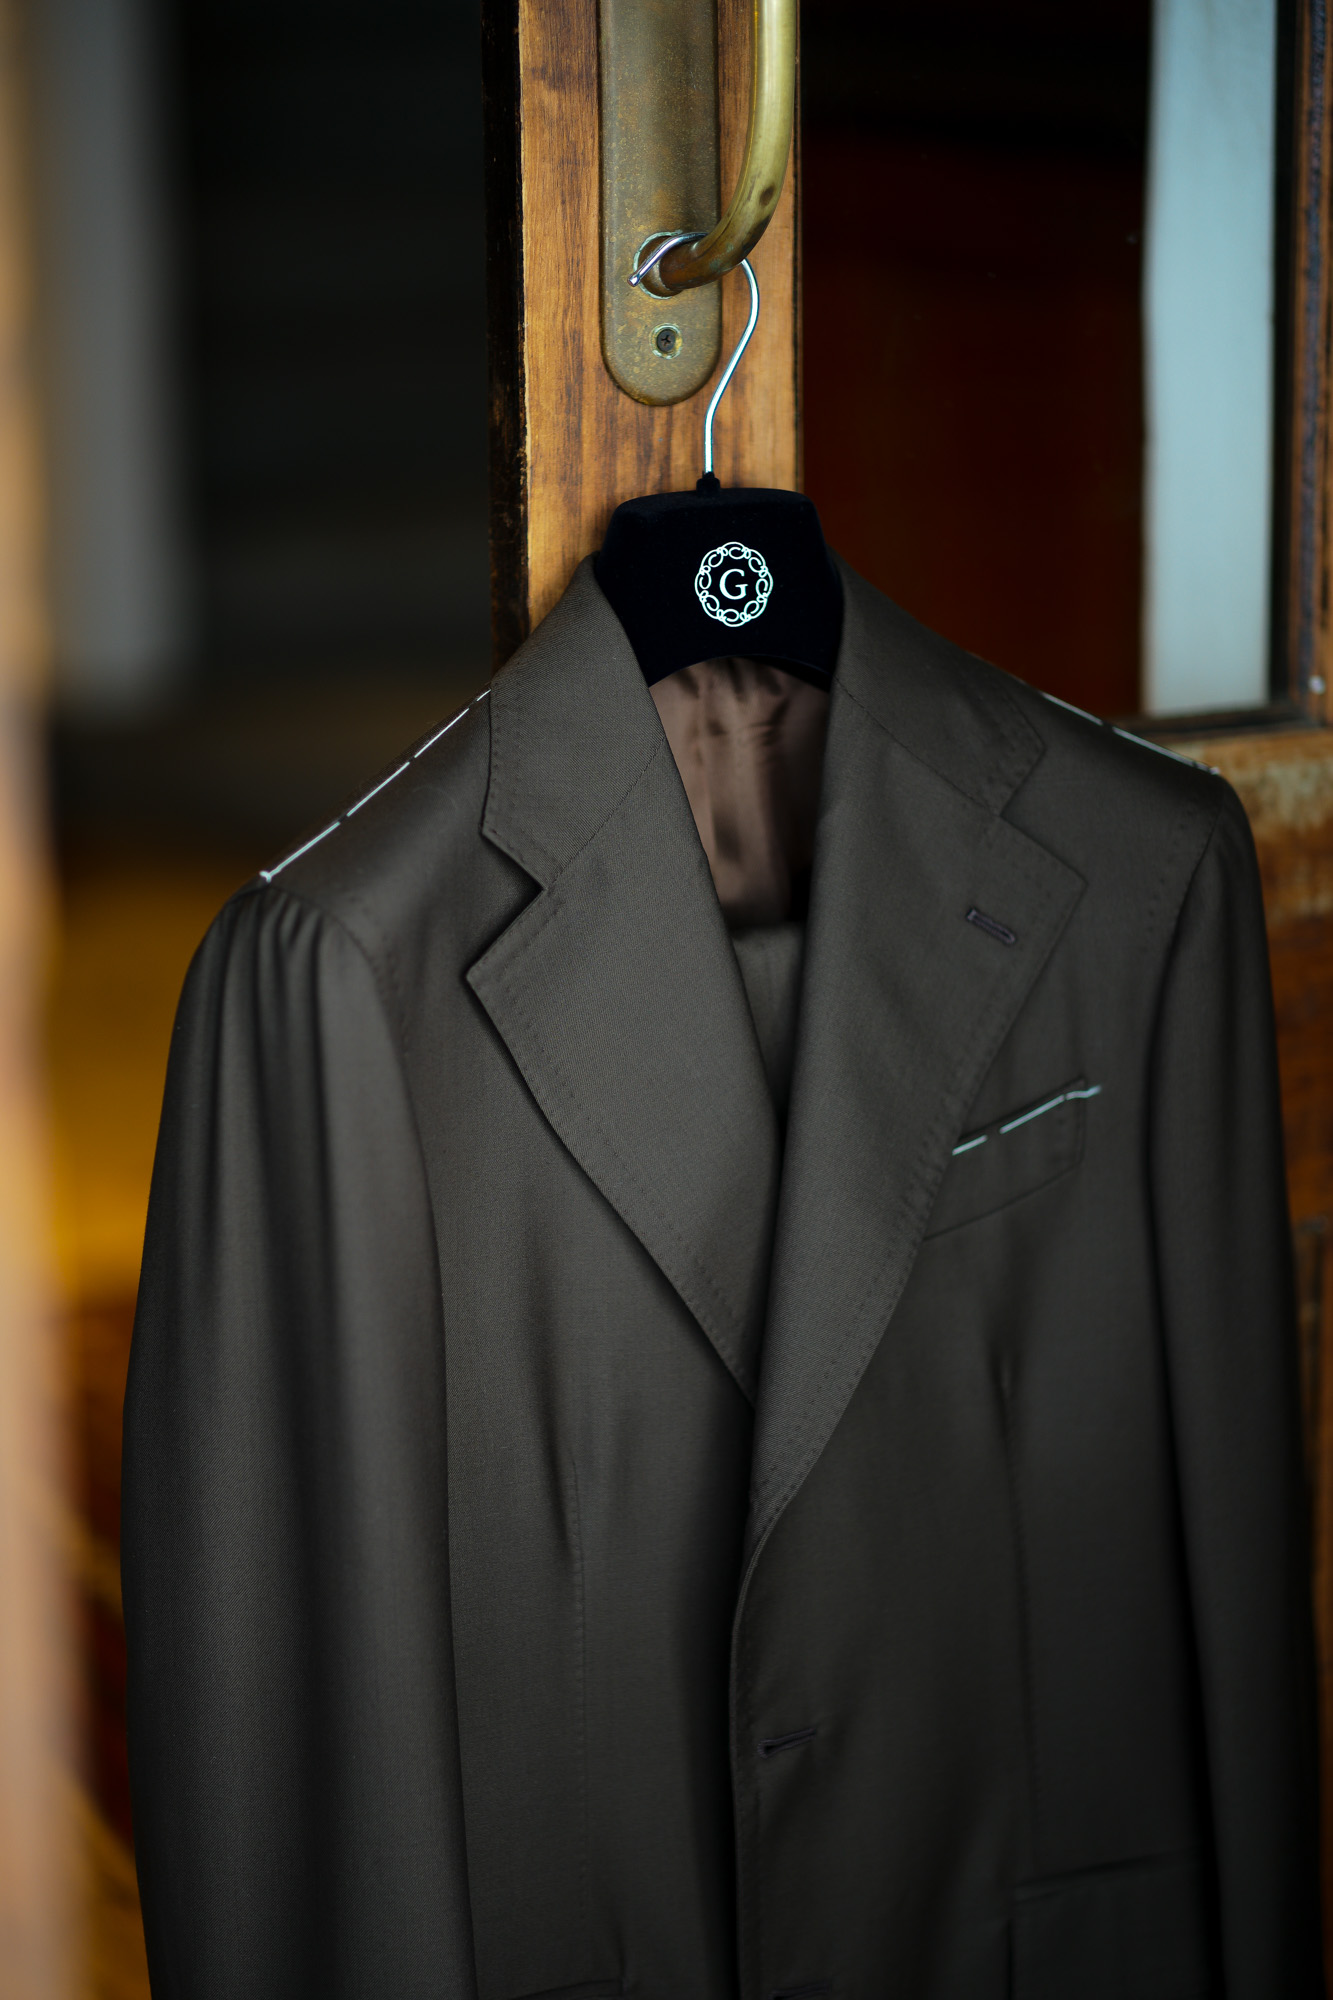 LUCA GRASSIA (ルカ グラシア) SALVATORE ENRICO (サルヴァトーレ エンリコ) サージウール スーツ BROWN (ブラウン) Made in italy (イタリア製) 2021秋冬 愛知 名古屋 Alto e Diritto altoediritto アルトエデリット